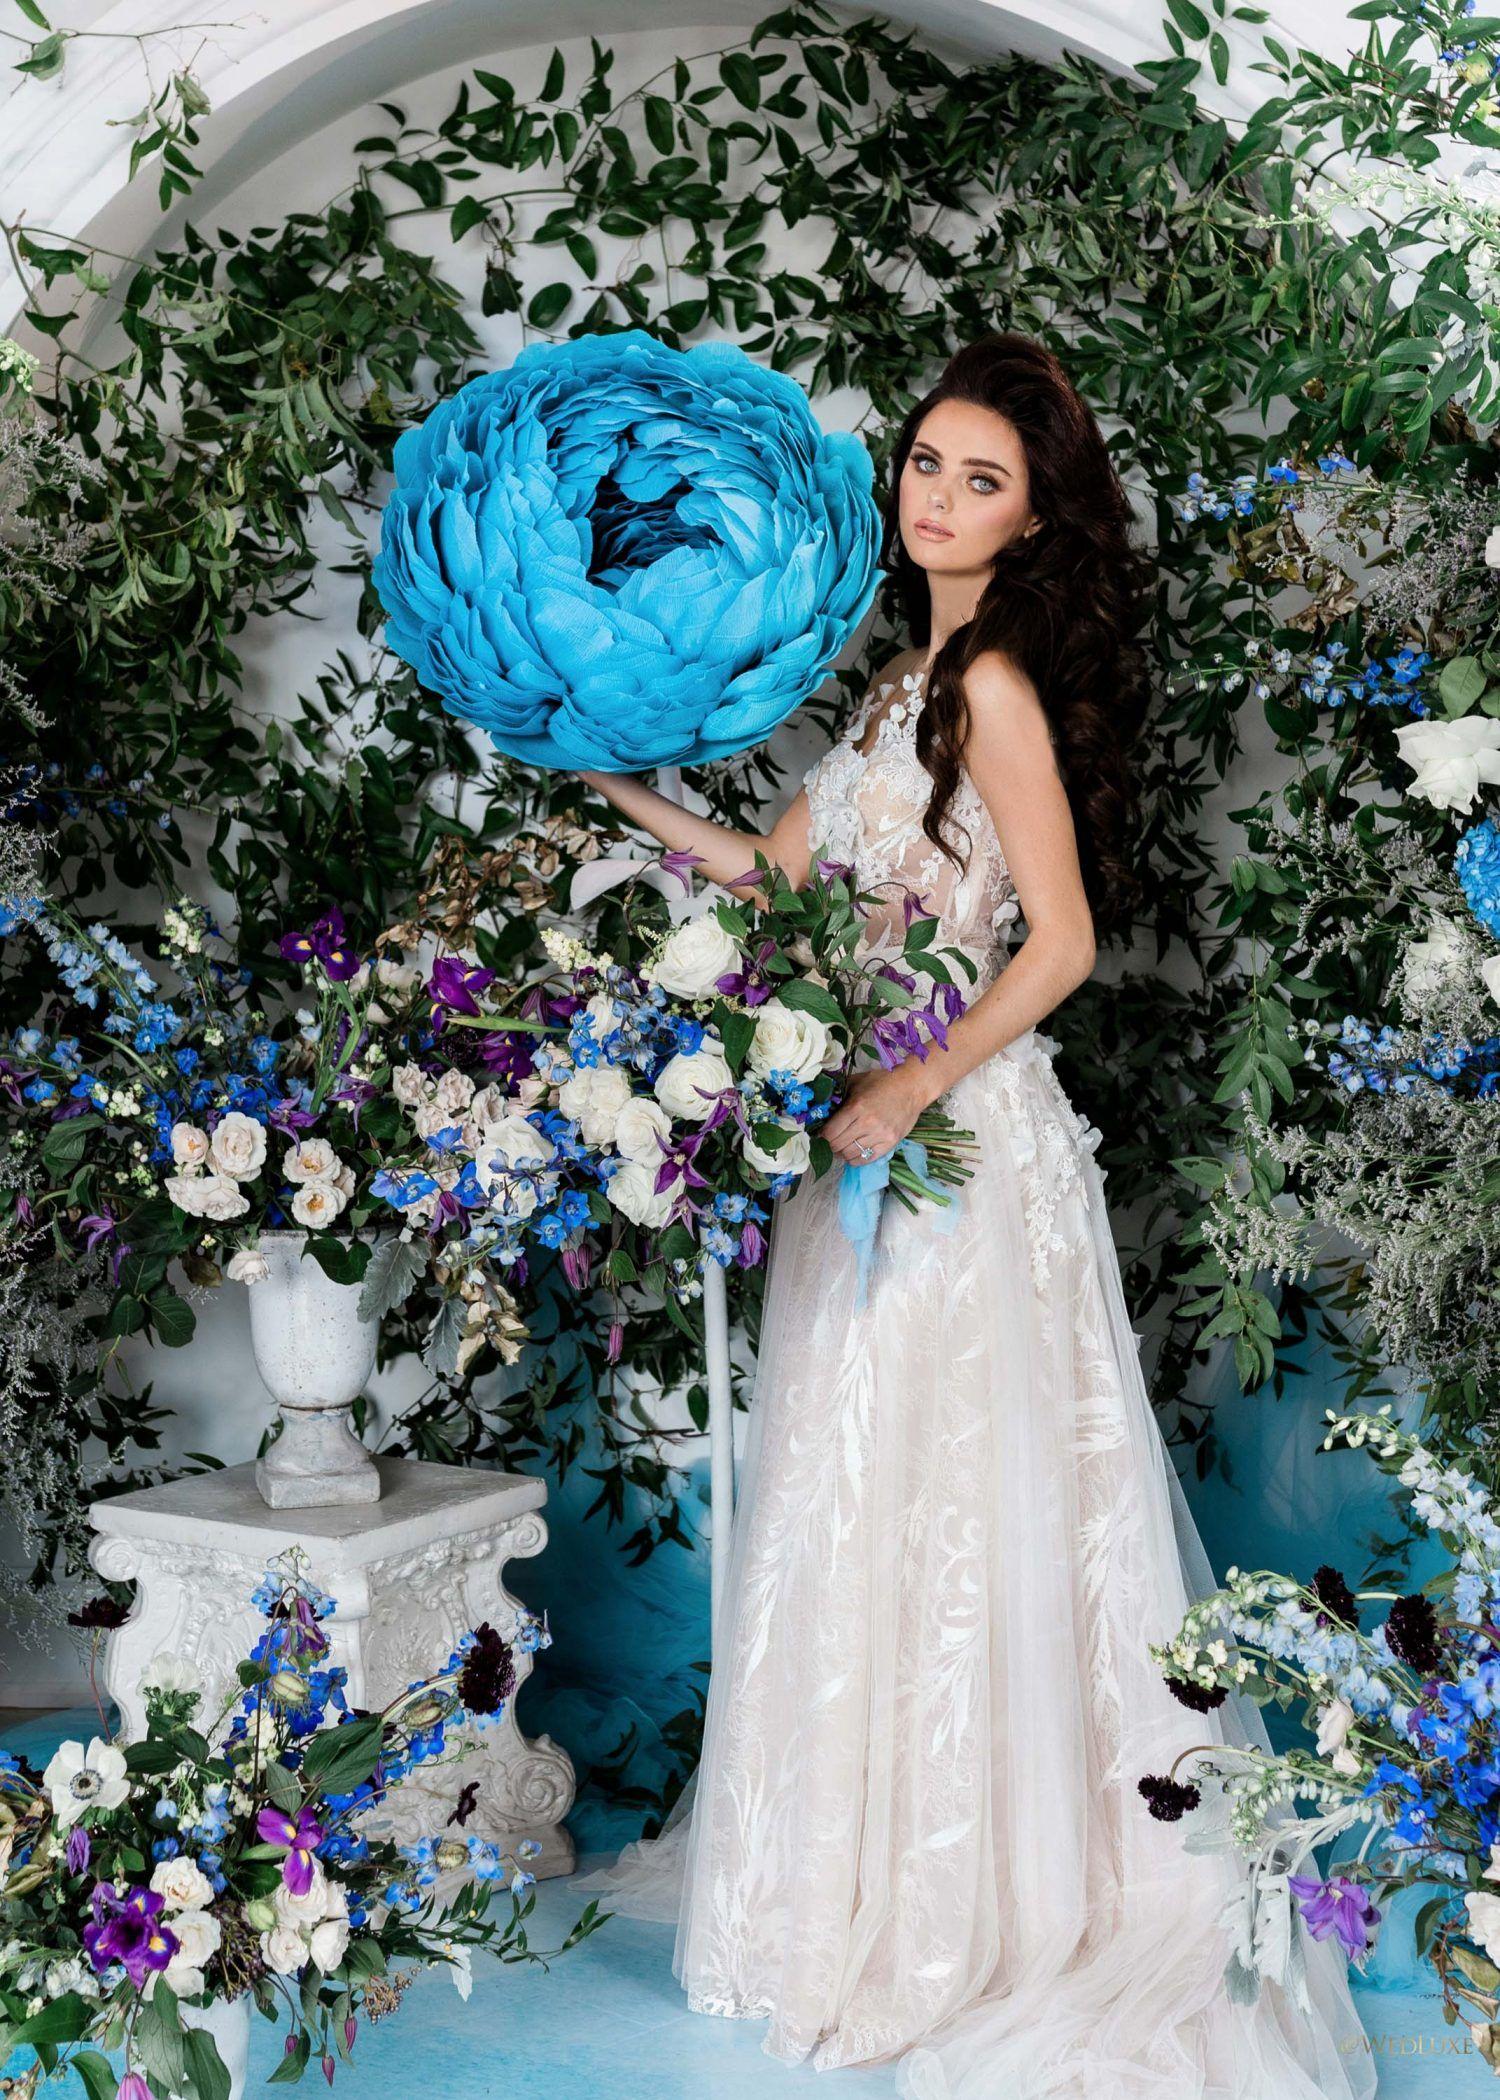 Blue Flower Styled Bridal Shoot